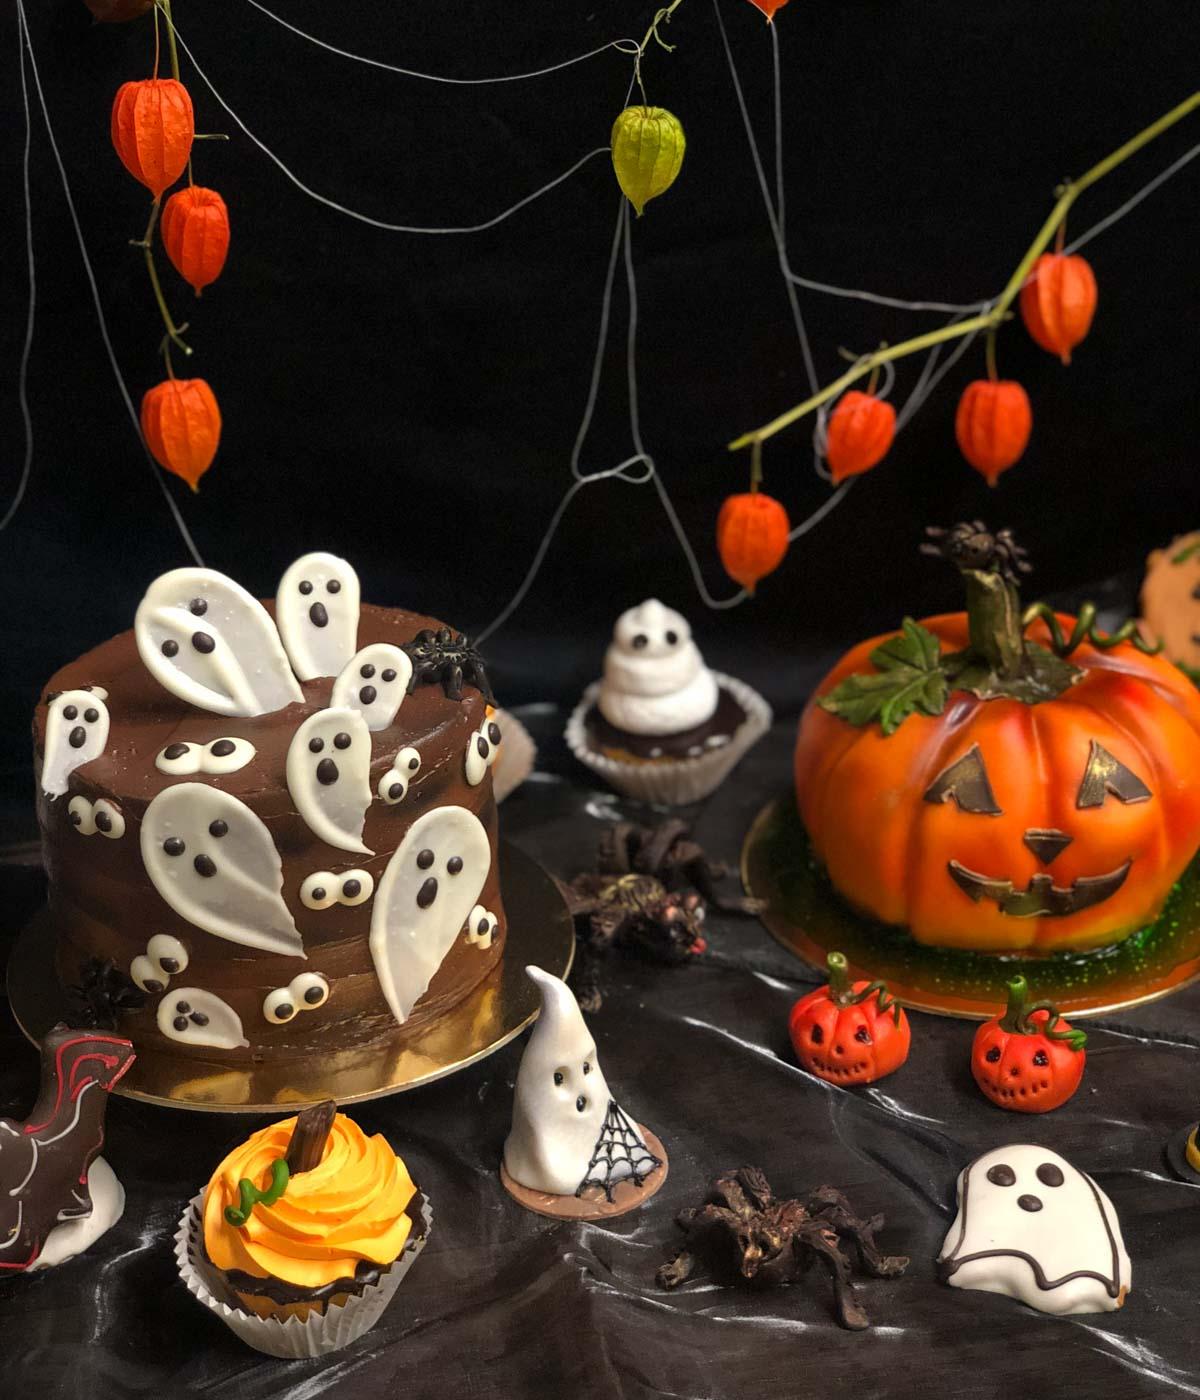 Helovino (Halloween) skanėstai